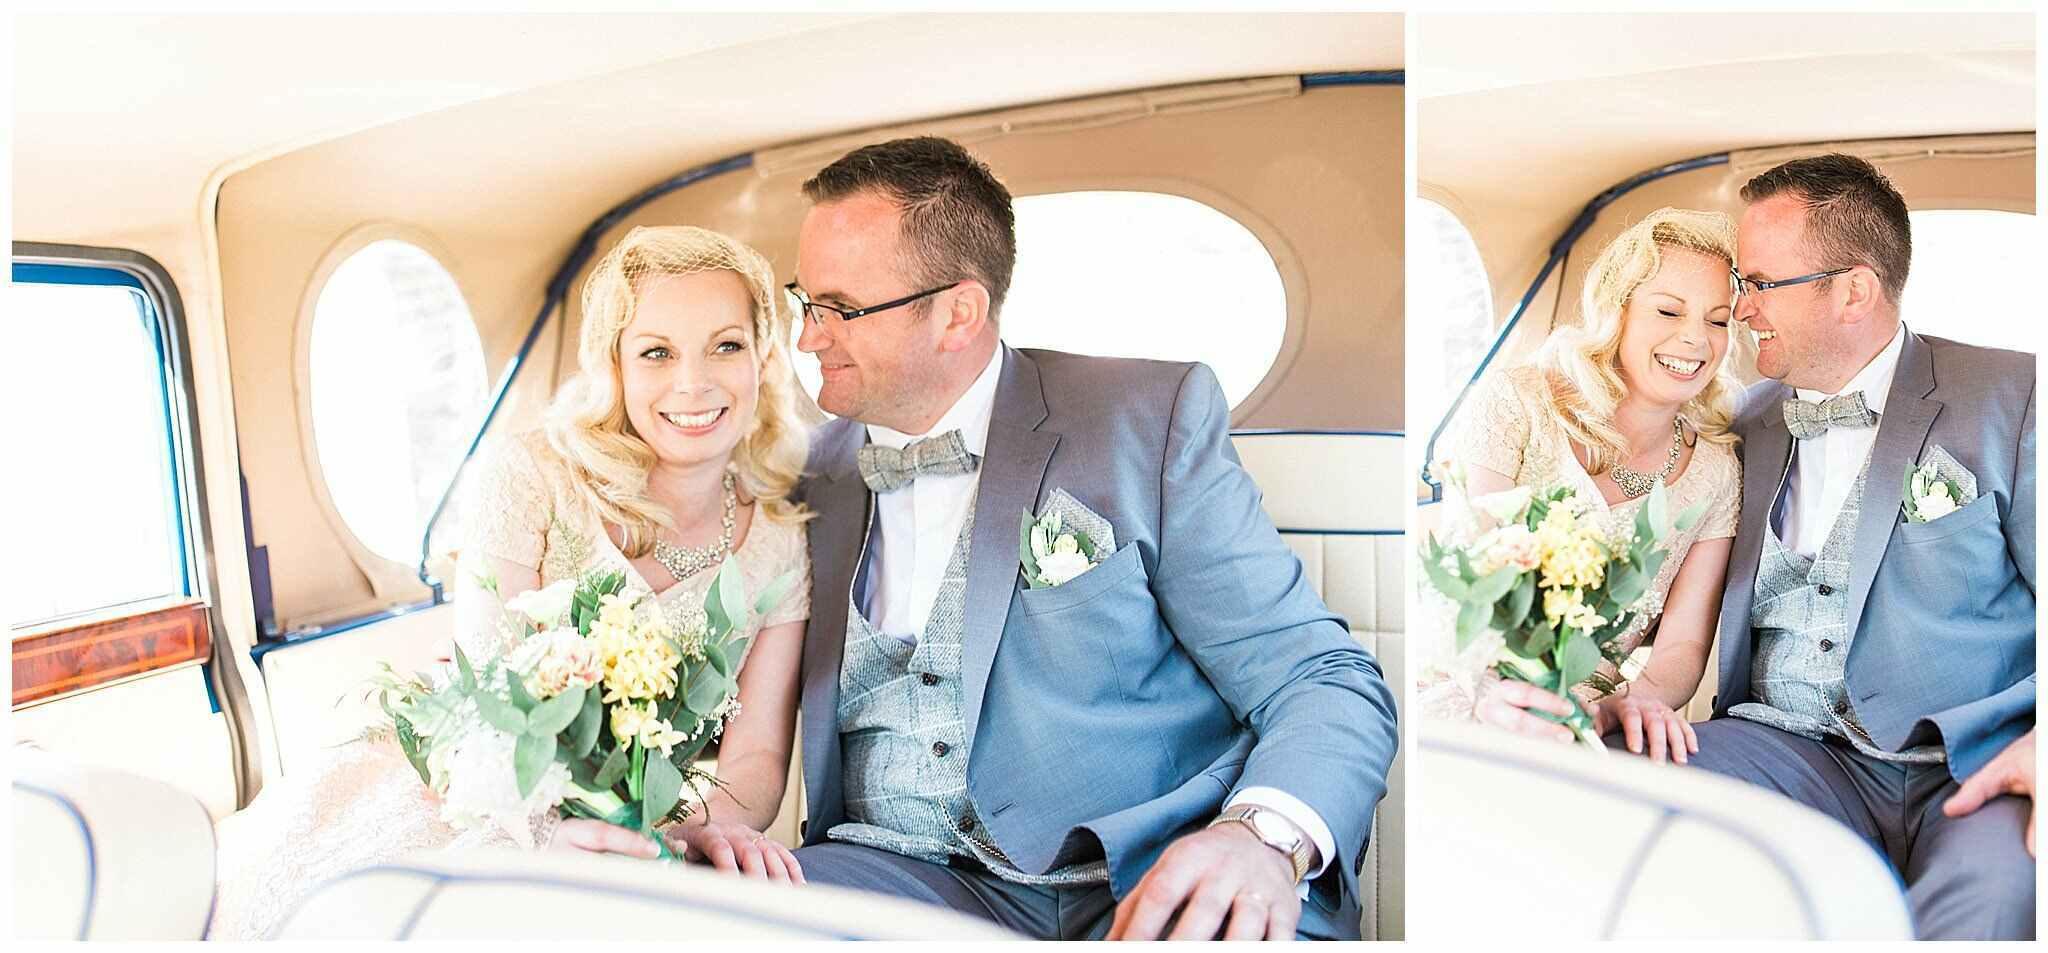 Deirdre + James wedding in Gougane Barra 20